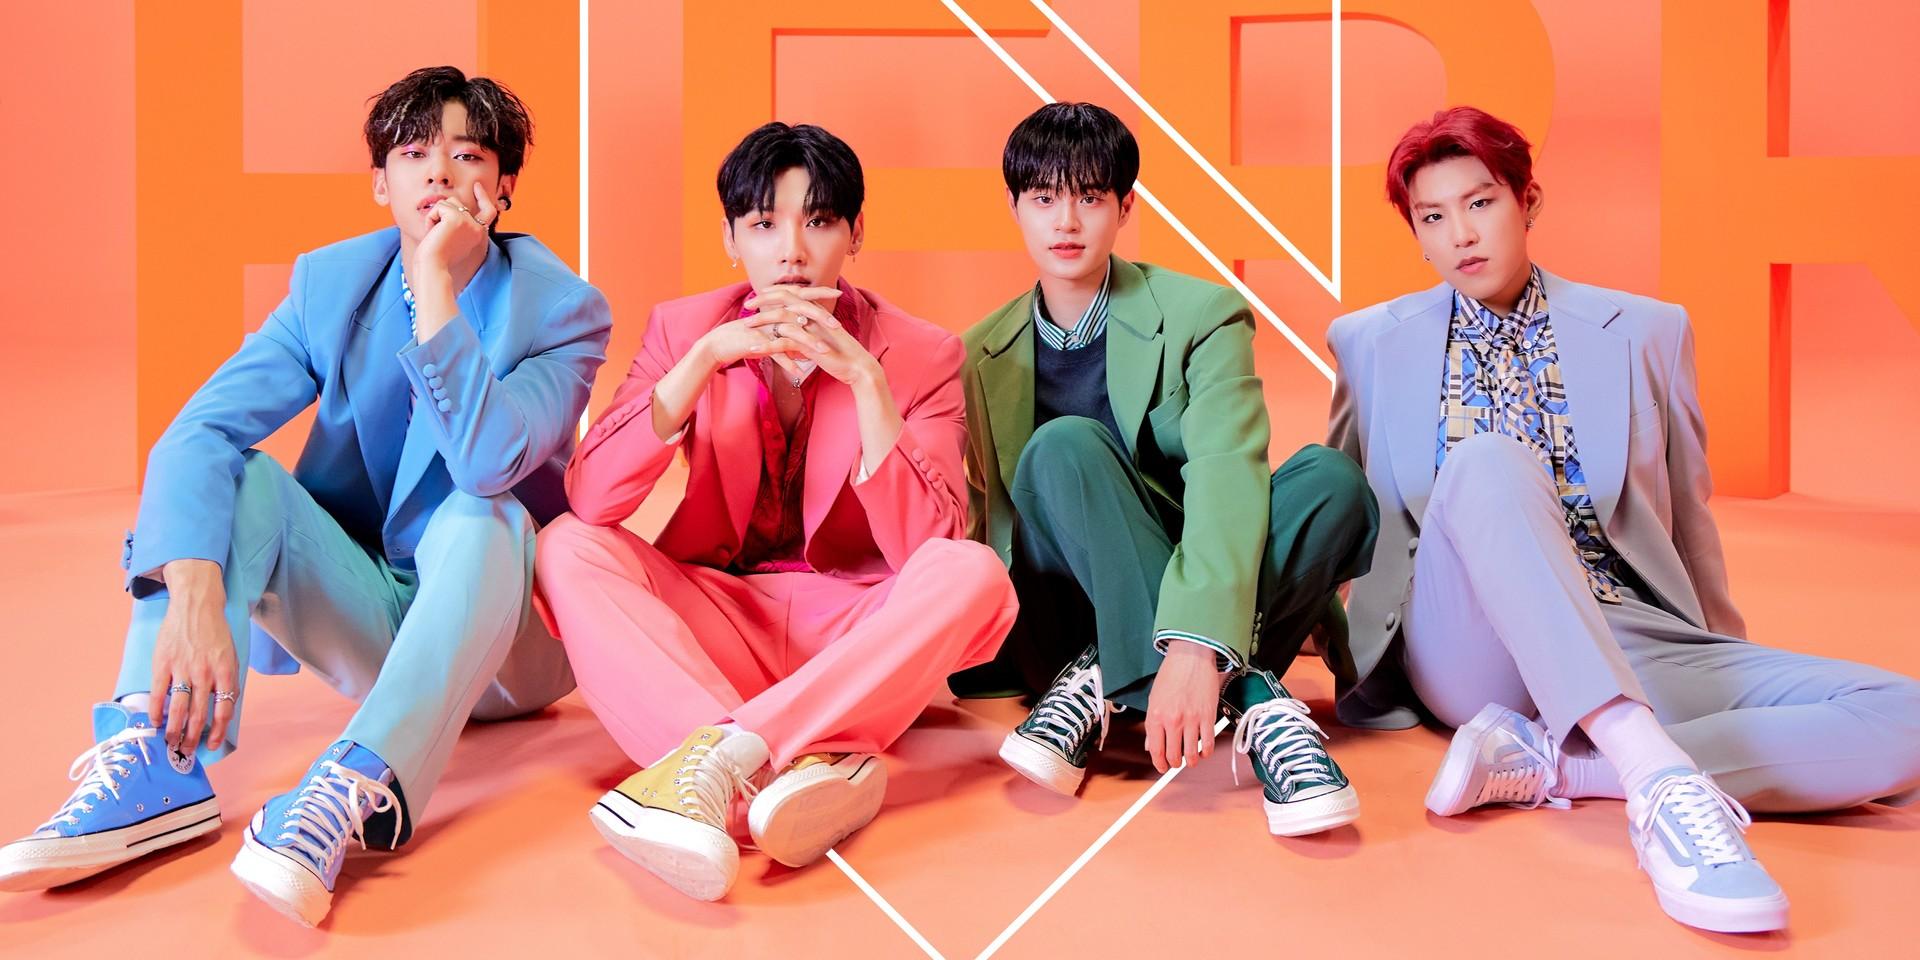 AB6IX to drop sophomore album 'MO' COMPLETE' this September